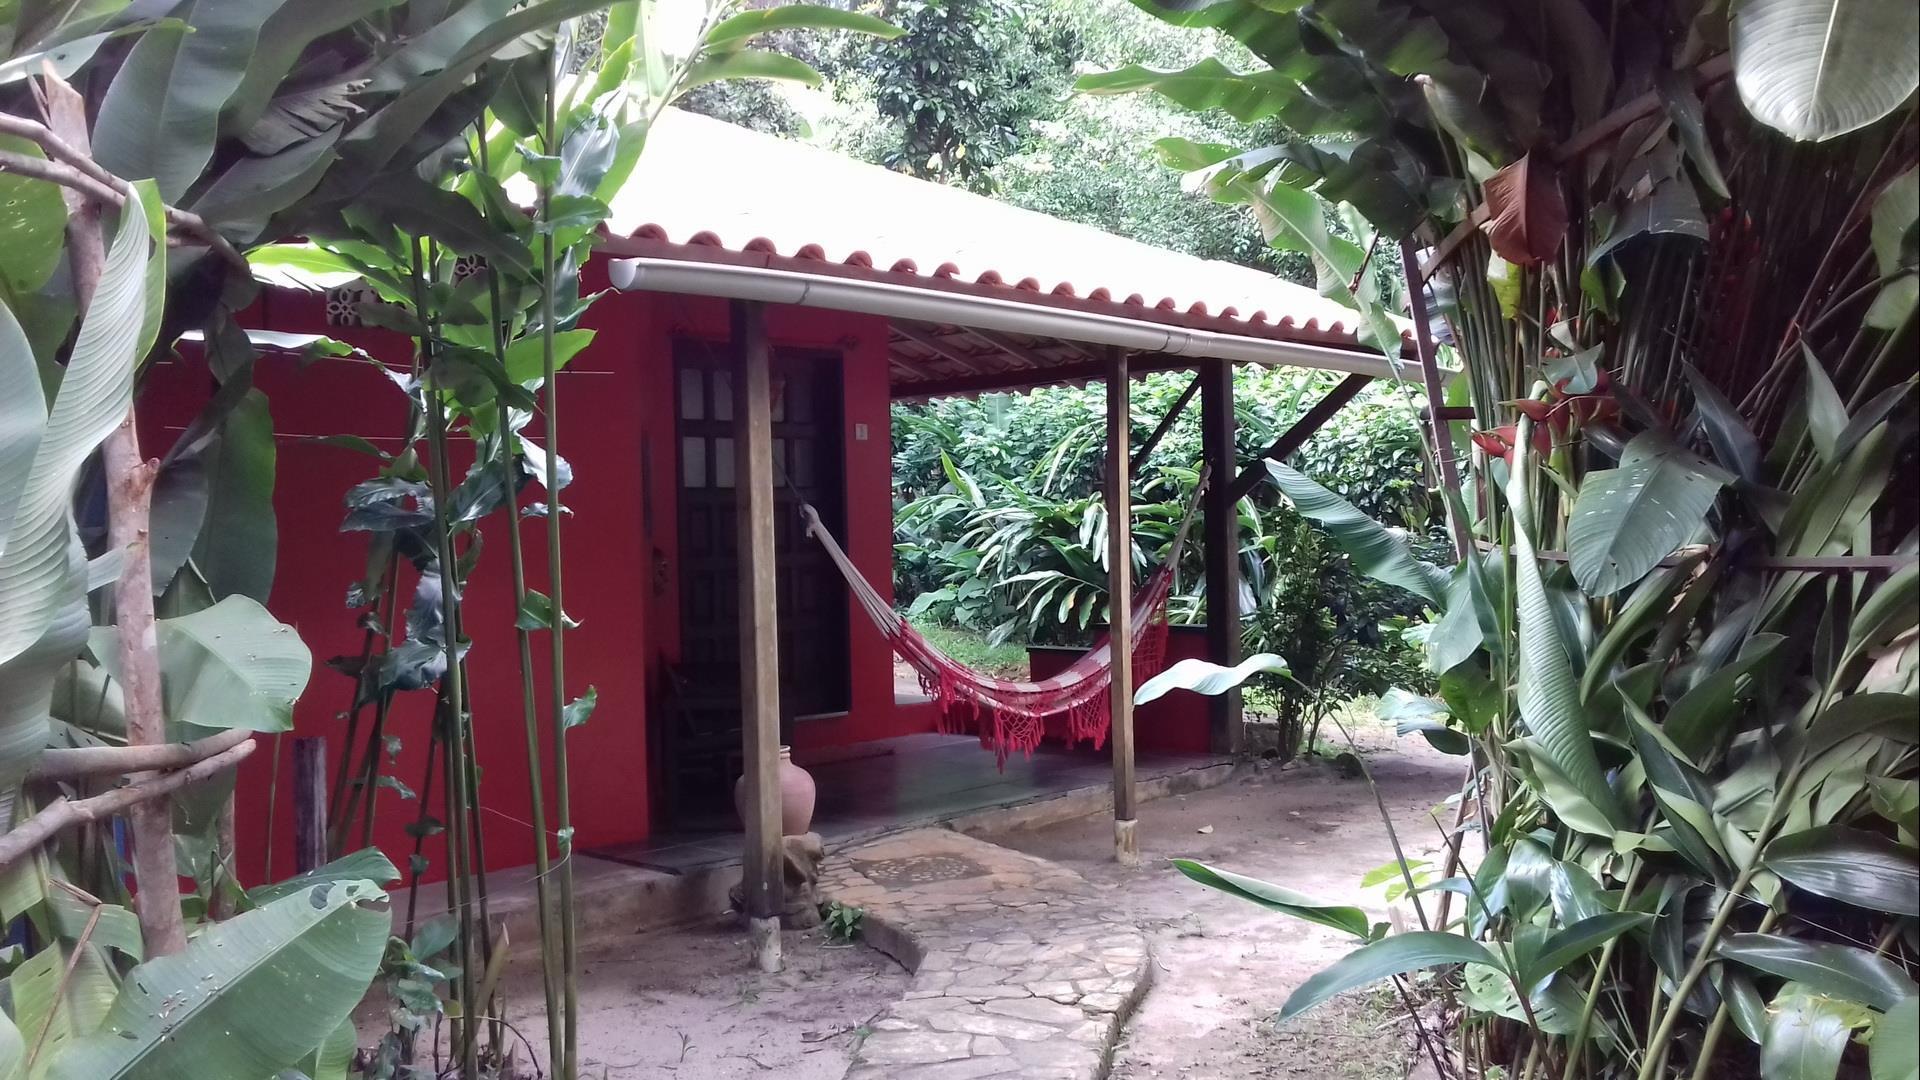 Brasilien Boipeba: Landestypische Unterkunft - Pousada Horizonte Azul